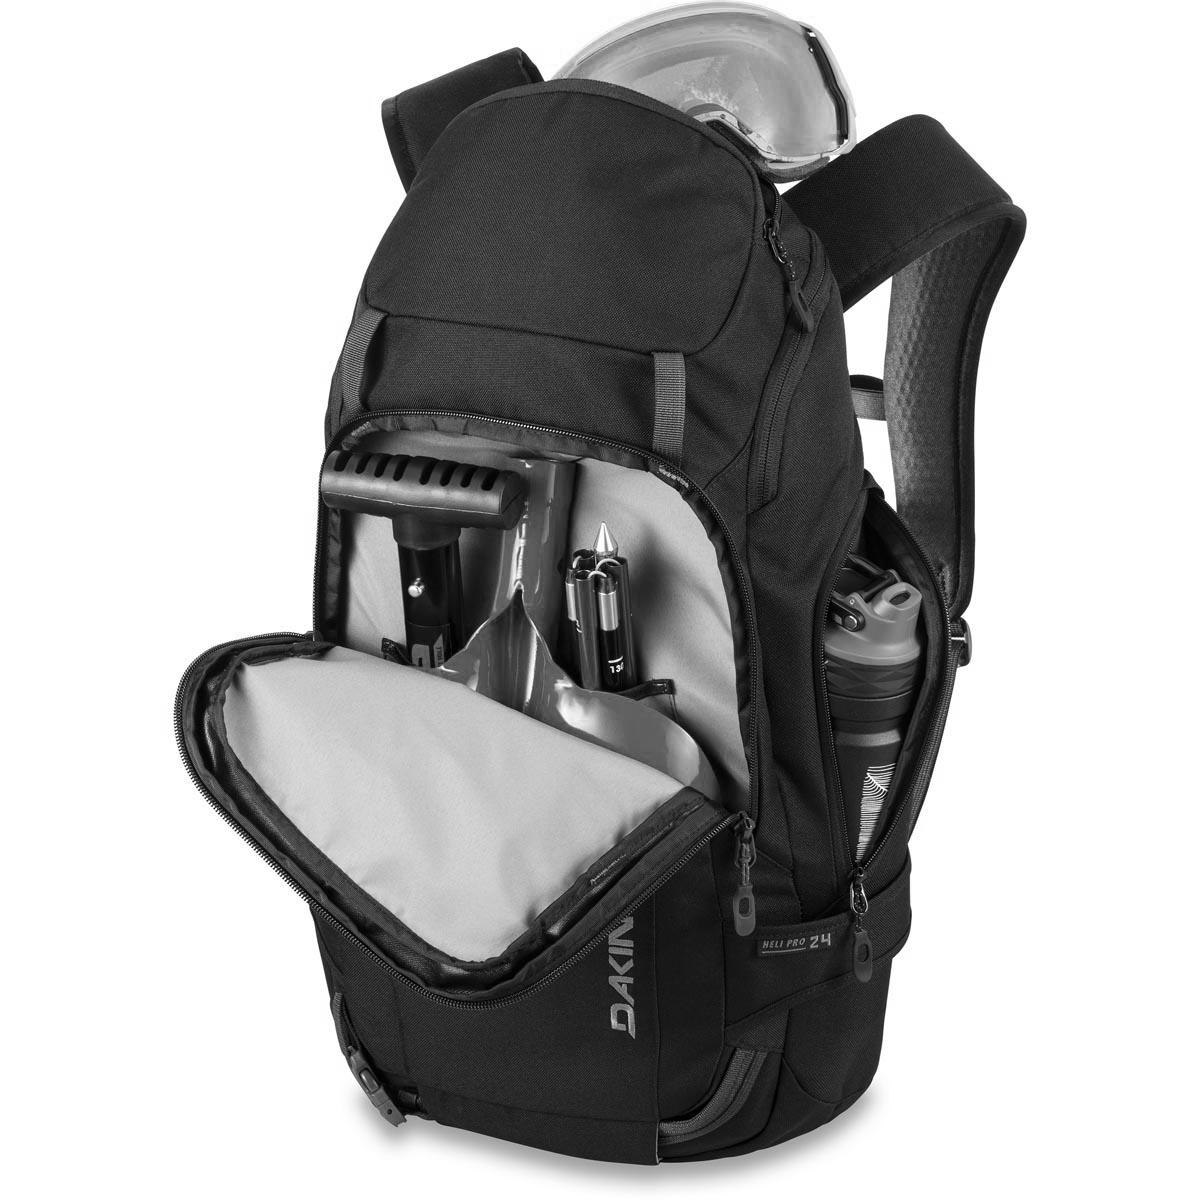 Dakine - Heli Pro 24L - Ski Touring backpack